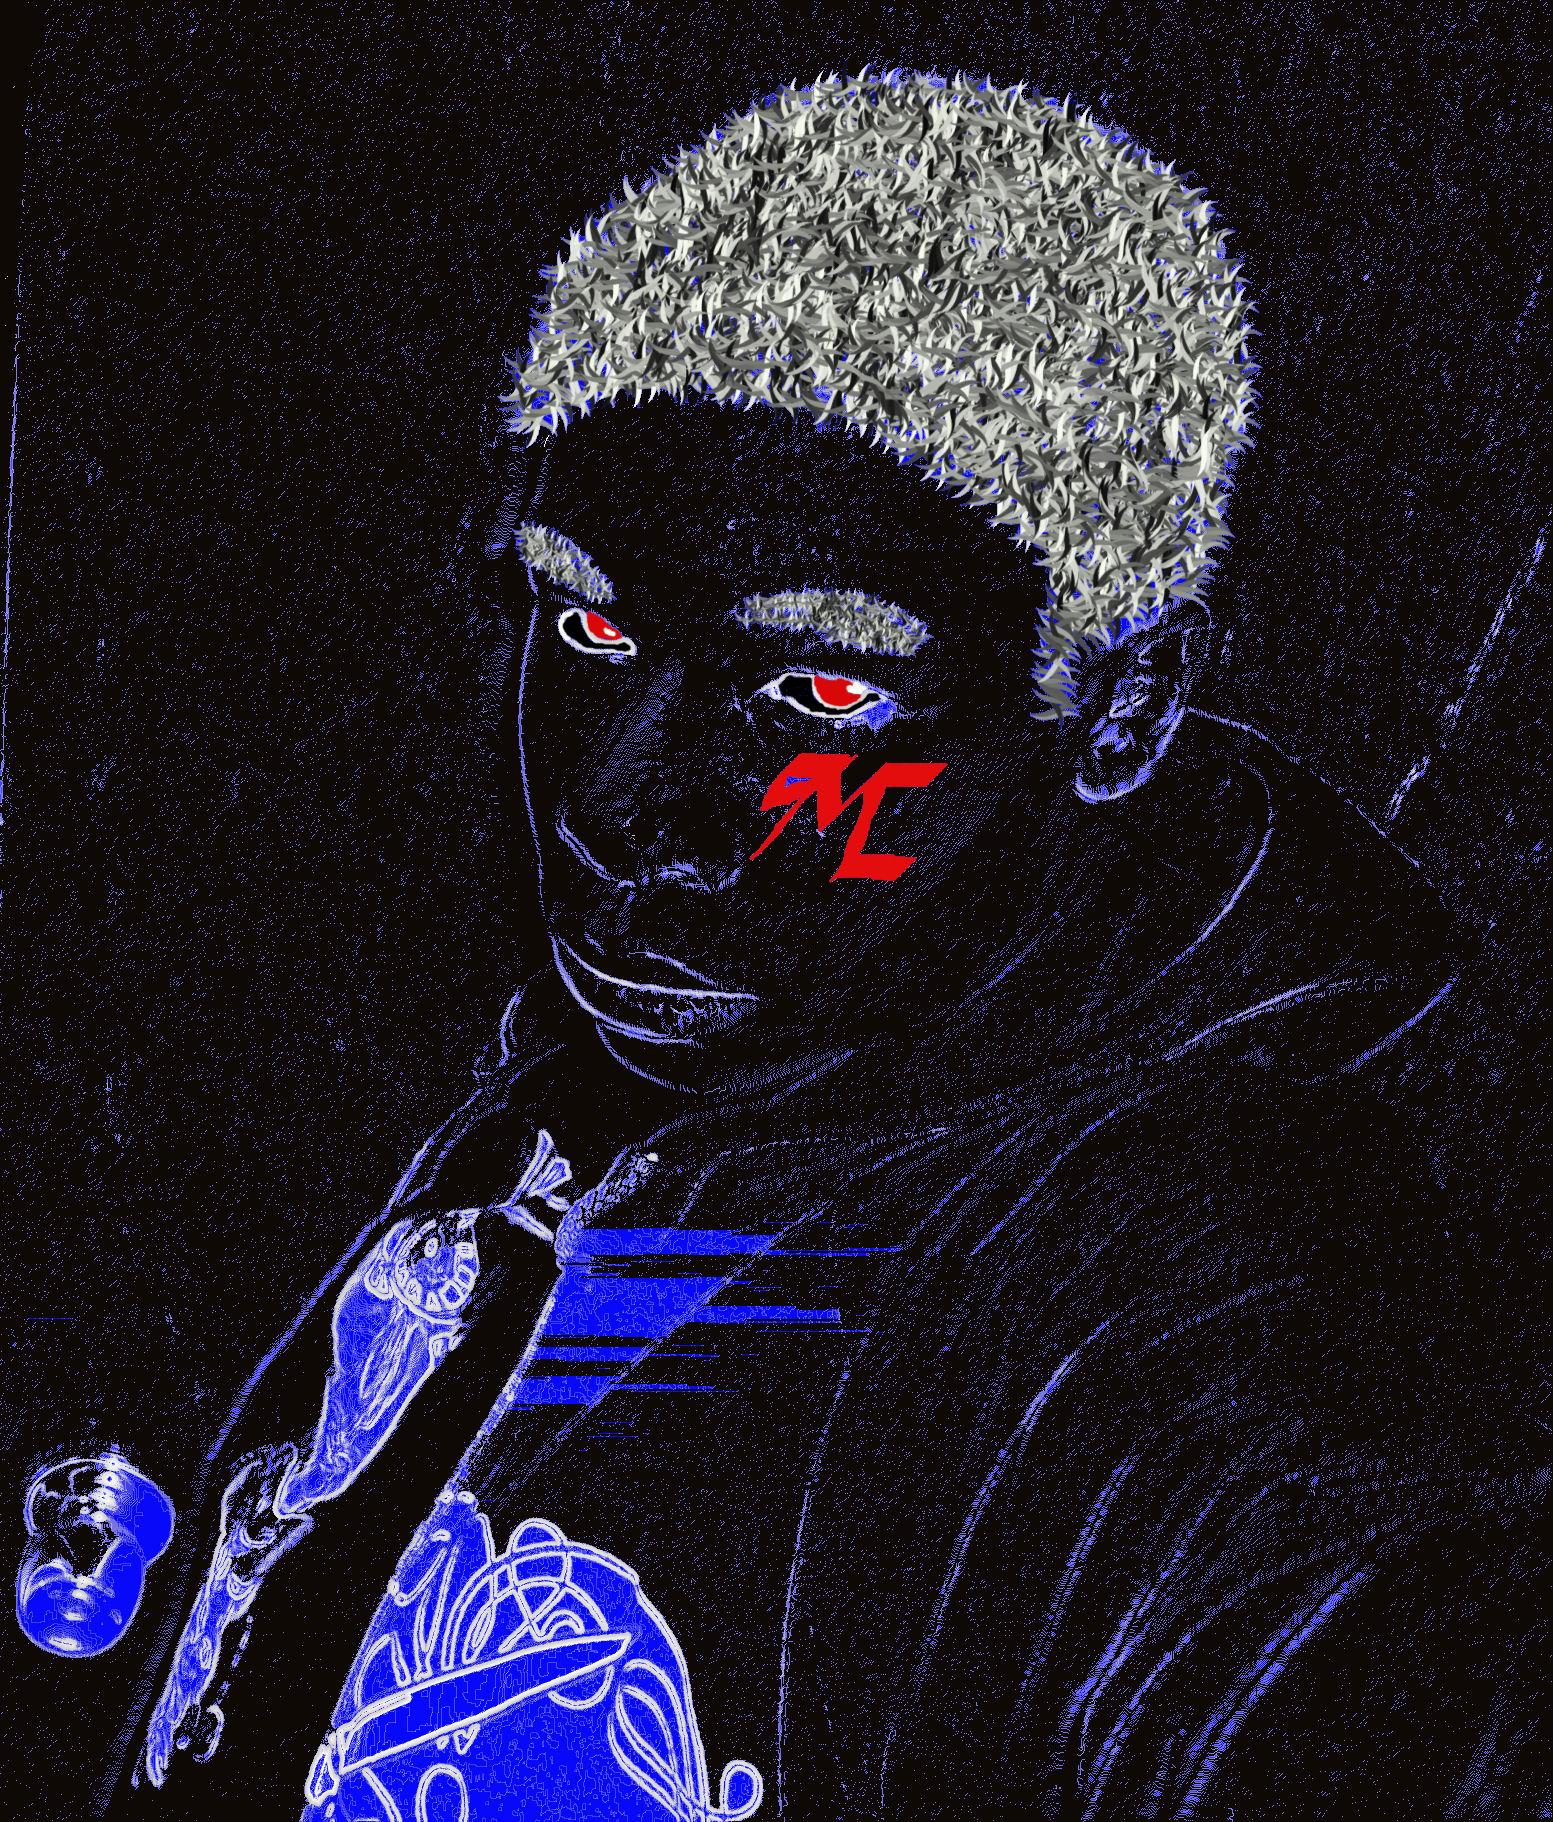 The artist-9MC by Nexusenigma